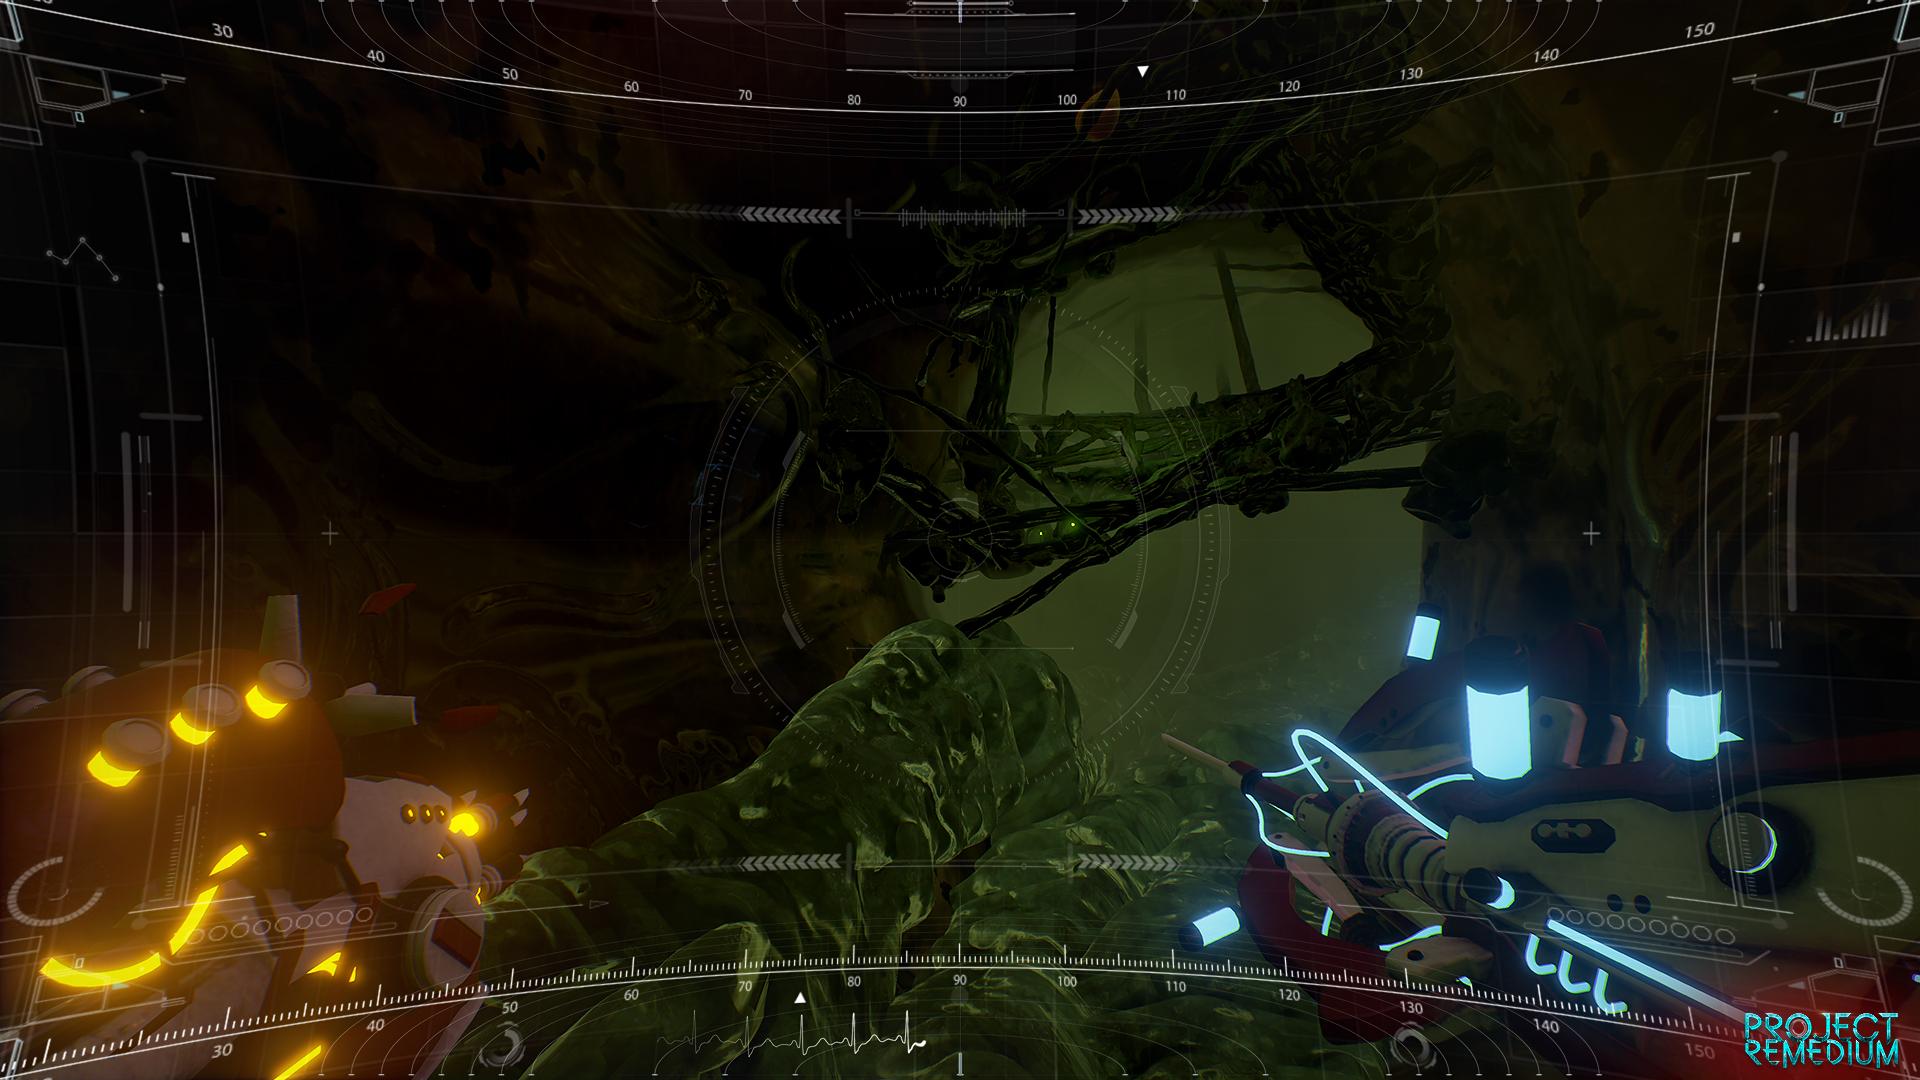 Project Remedium screenshot